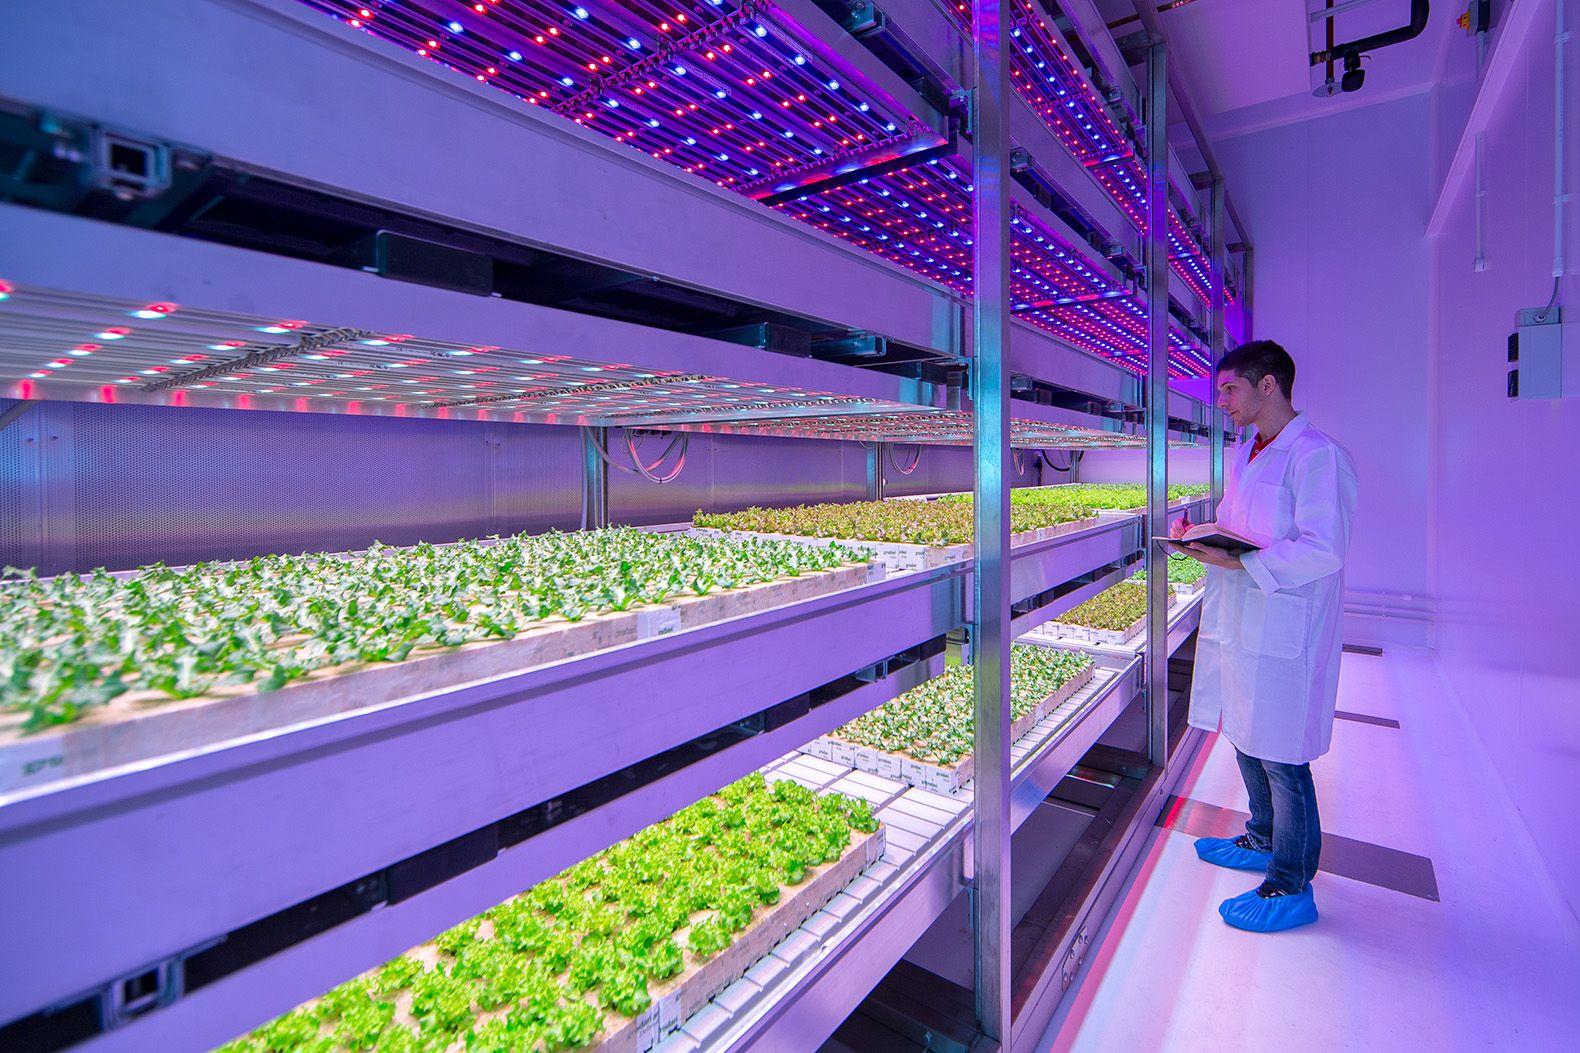 Philips New Growwise Indoor Farm Will Revolutionize Food 400 x 300